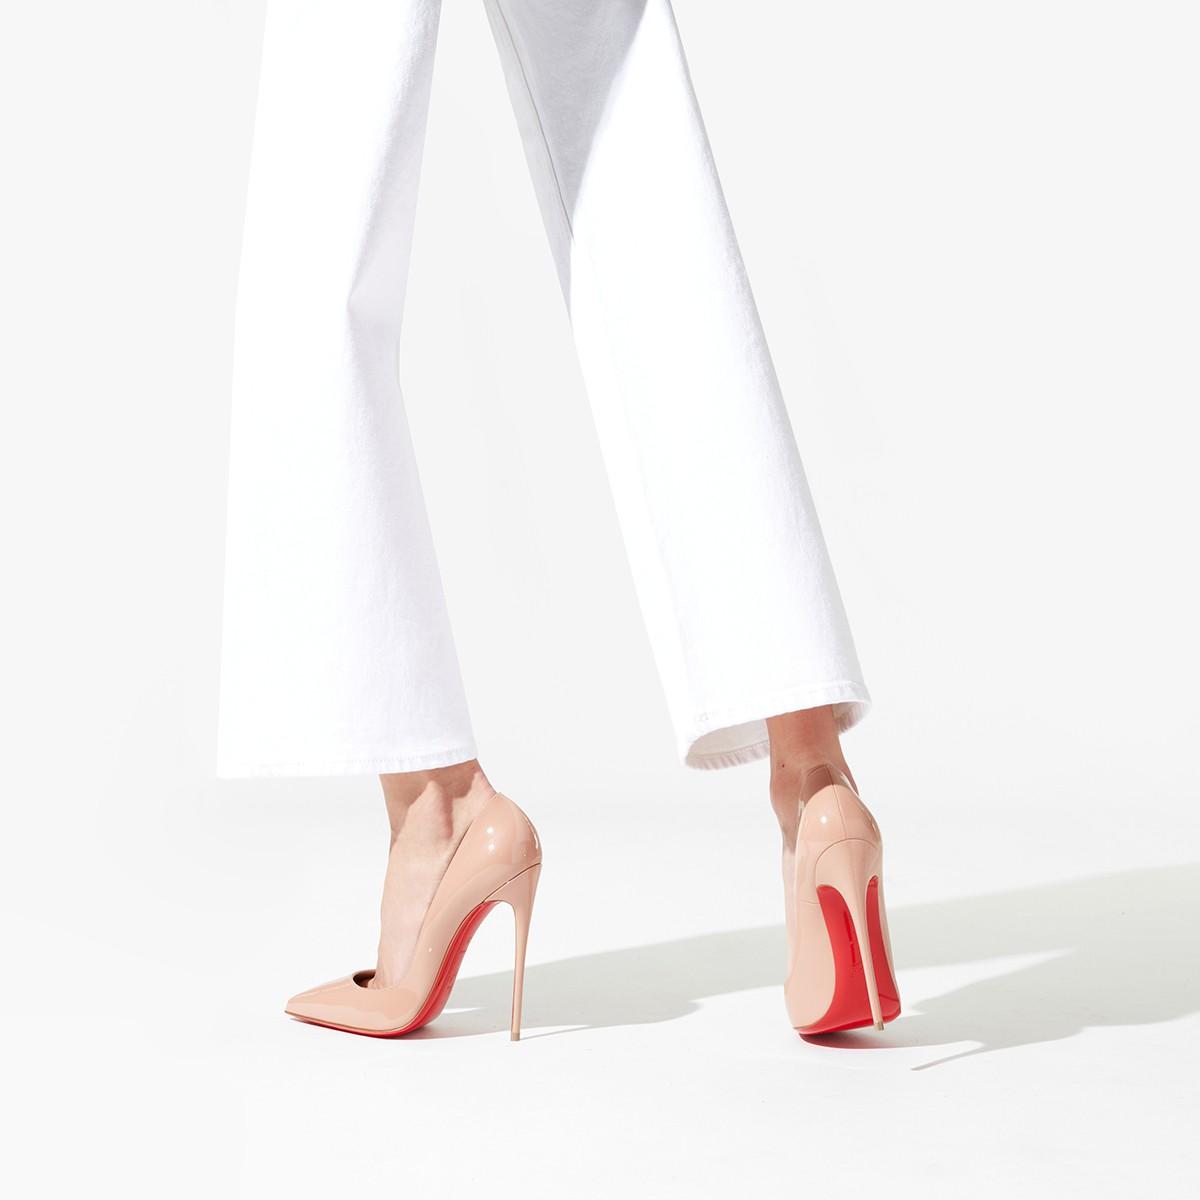 Women Shoes - So Kate - Christian Louboutin